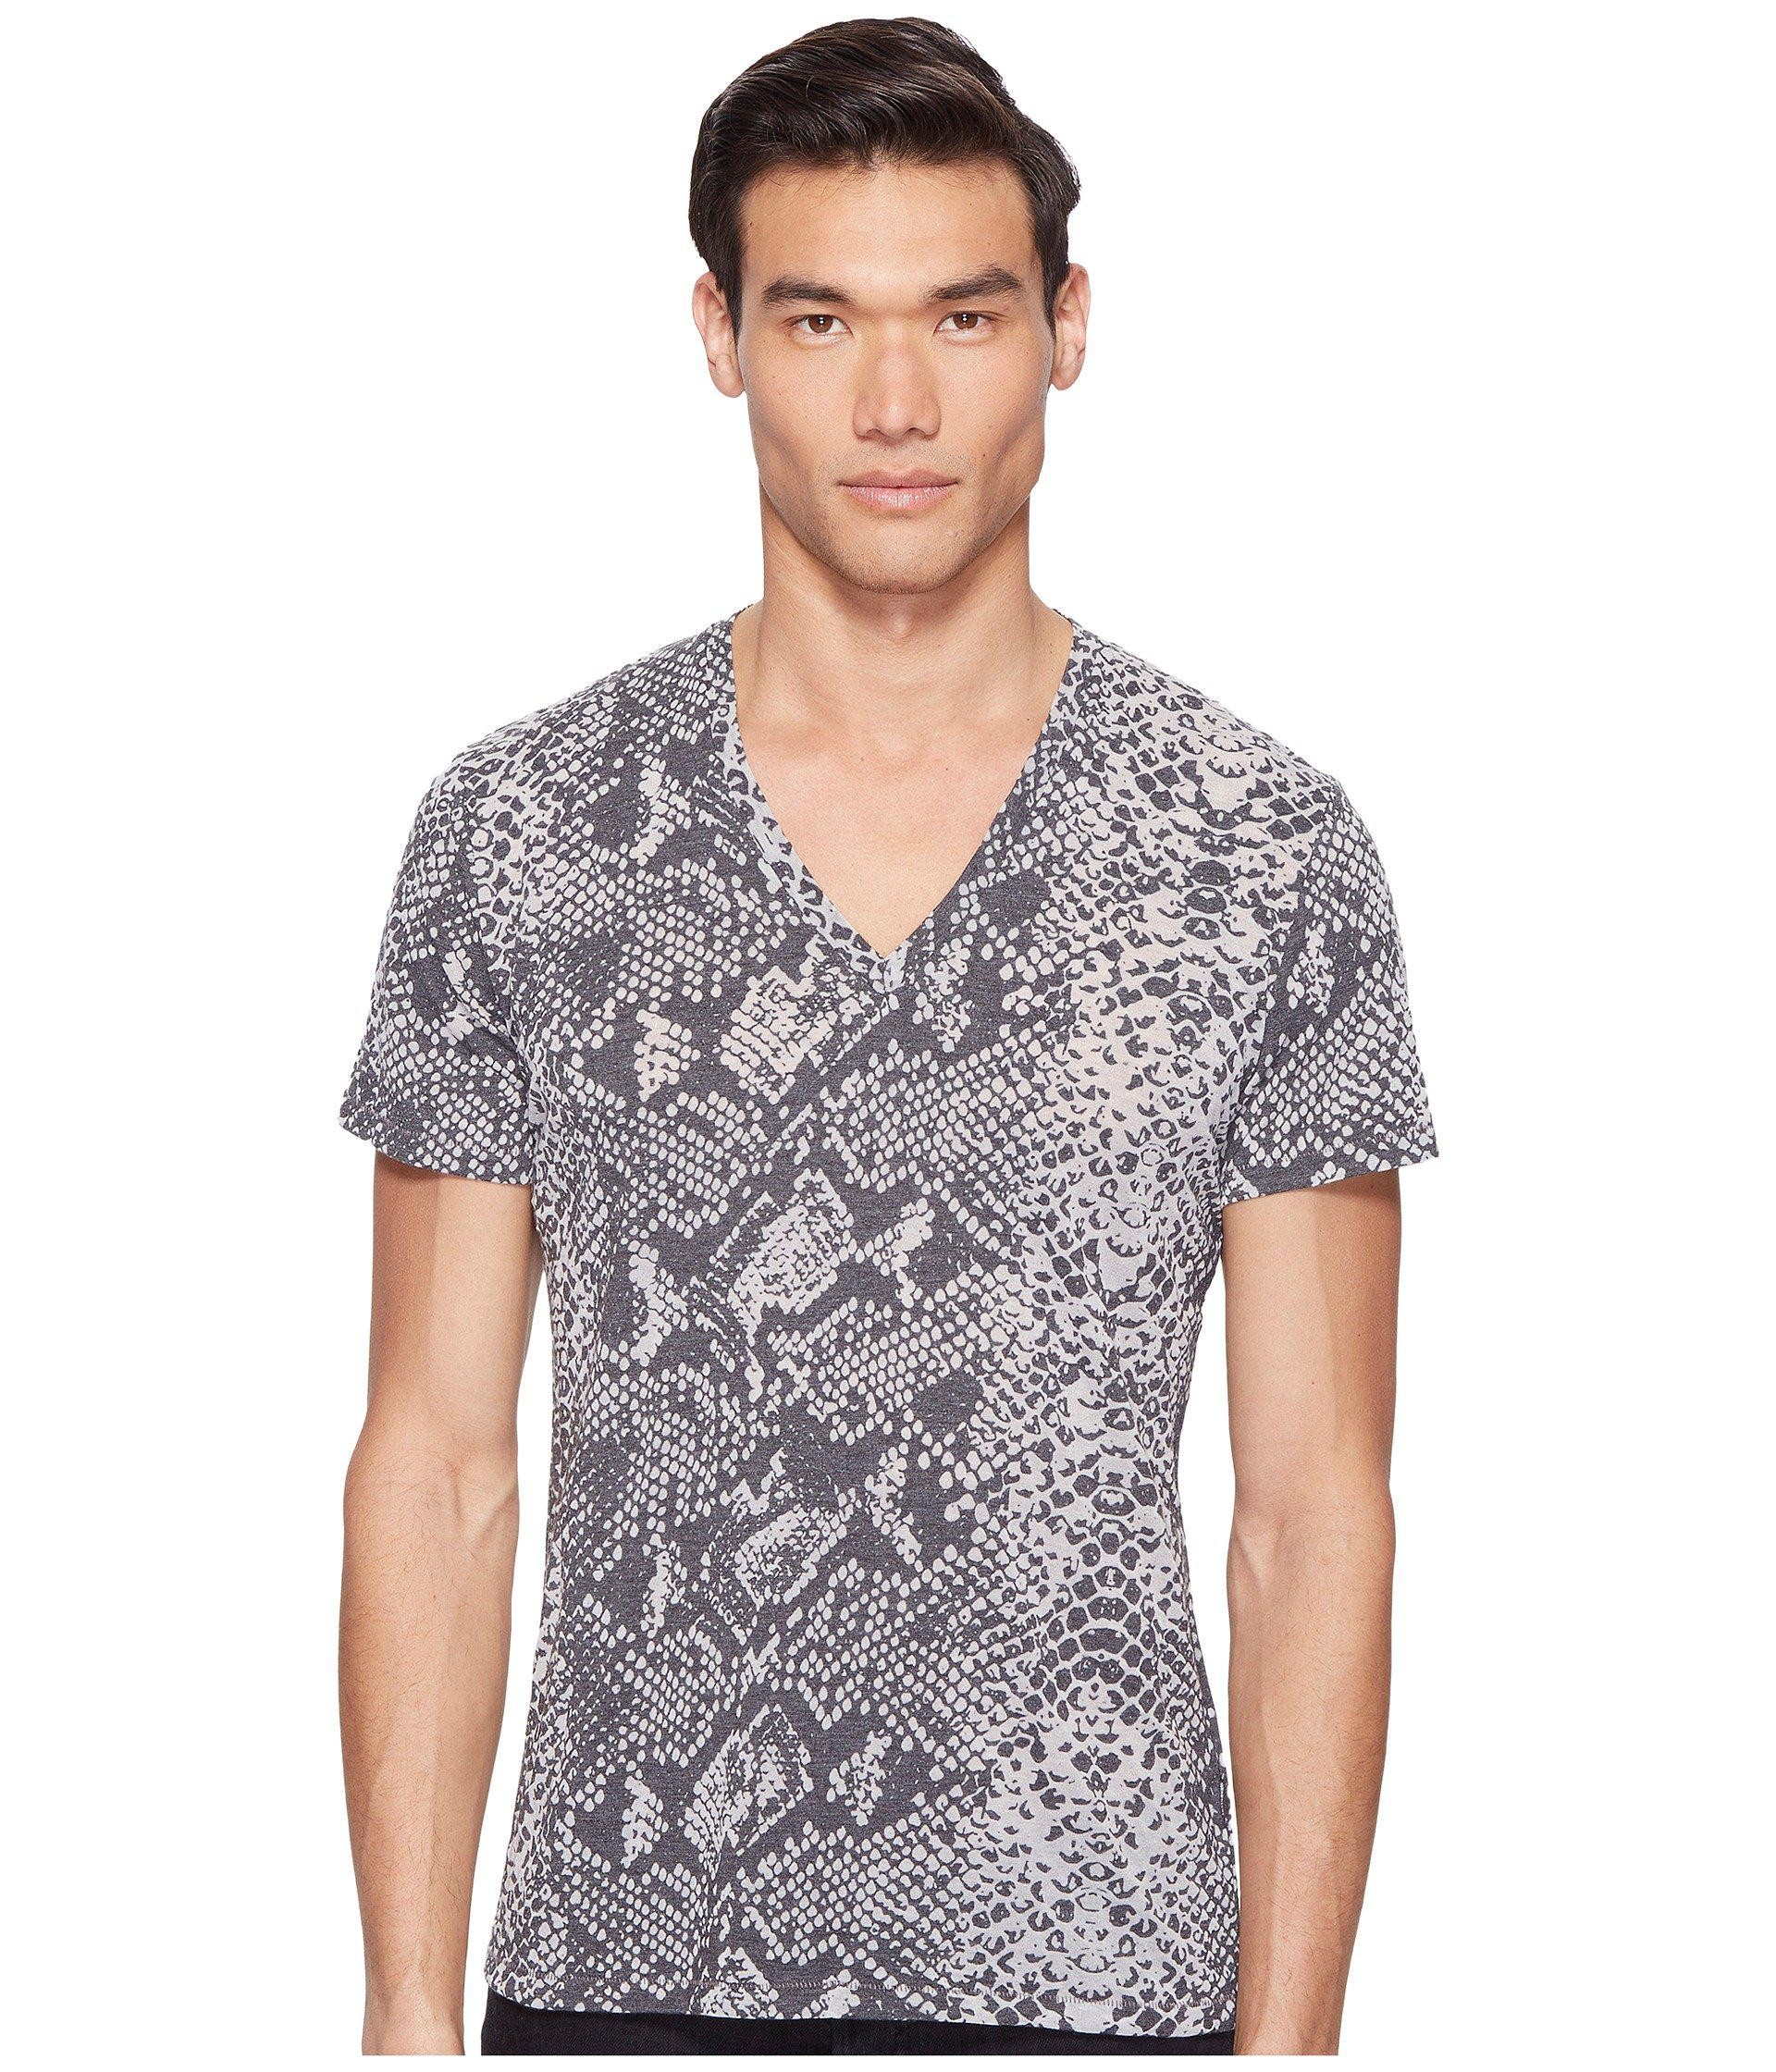 Just Cavalli snakeskin print T-shirt Nicekicks Sale Online Buy Cheap Huge Surprise Cheap Sale Brand New Unisex Discount Low Cost Pick A Best Cheap Online LHKUqv